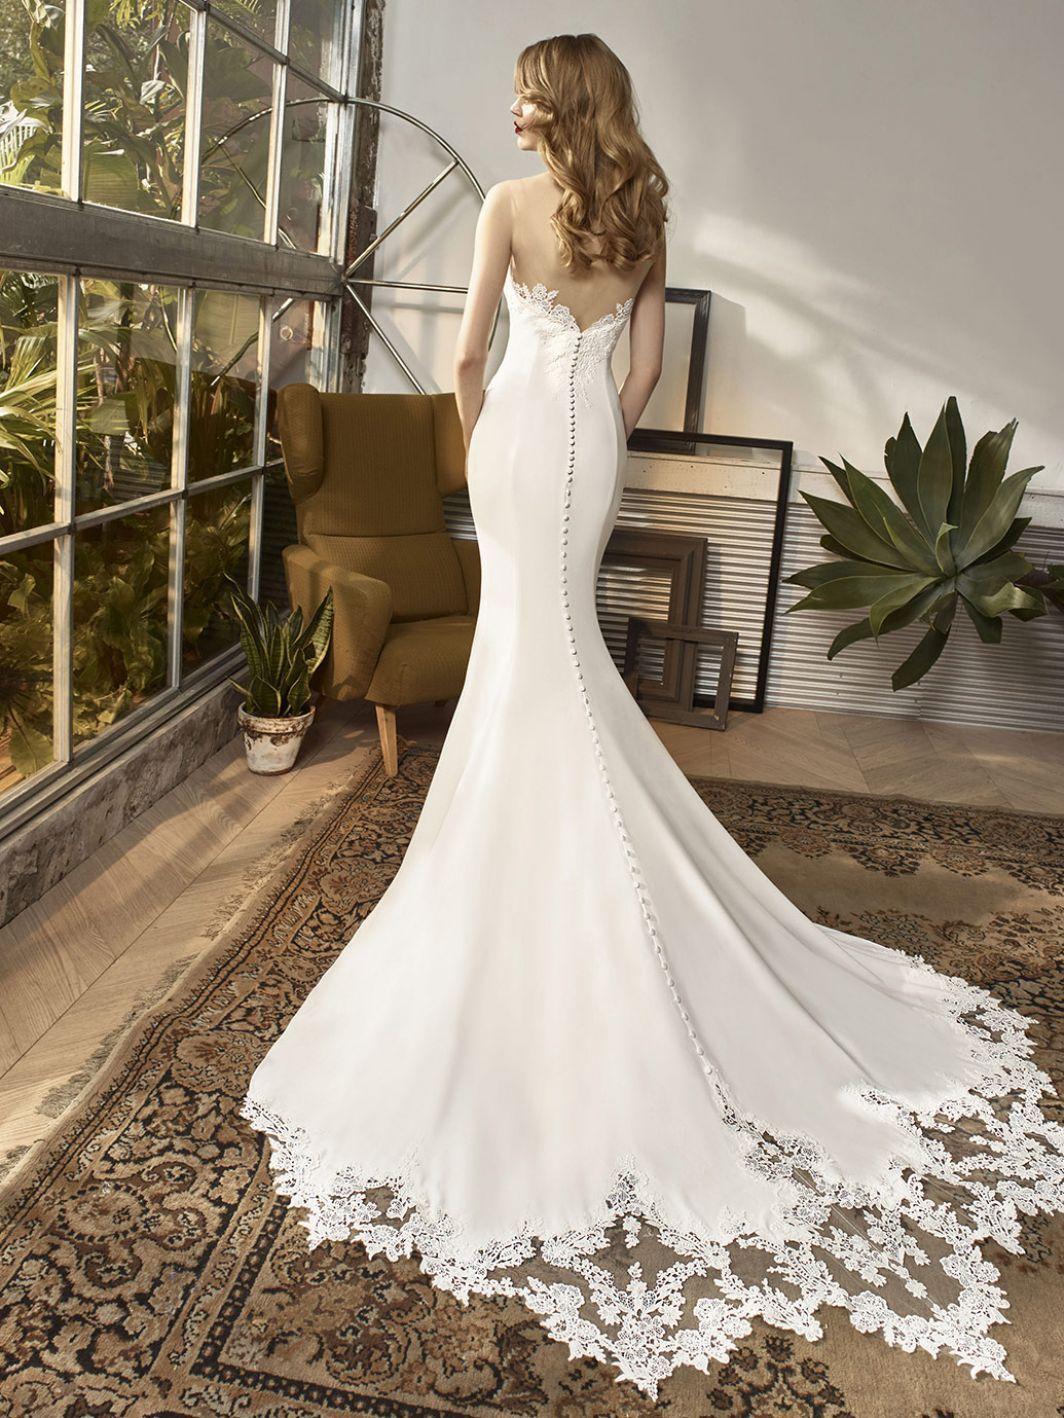 Bt18 30 Back Wedding Dresses Enzoani Wedding Dresses Wedding Dress Shopping [ 1418 x 1064 Pixel ]